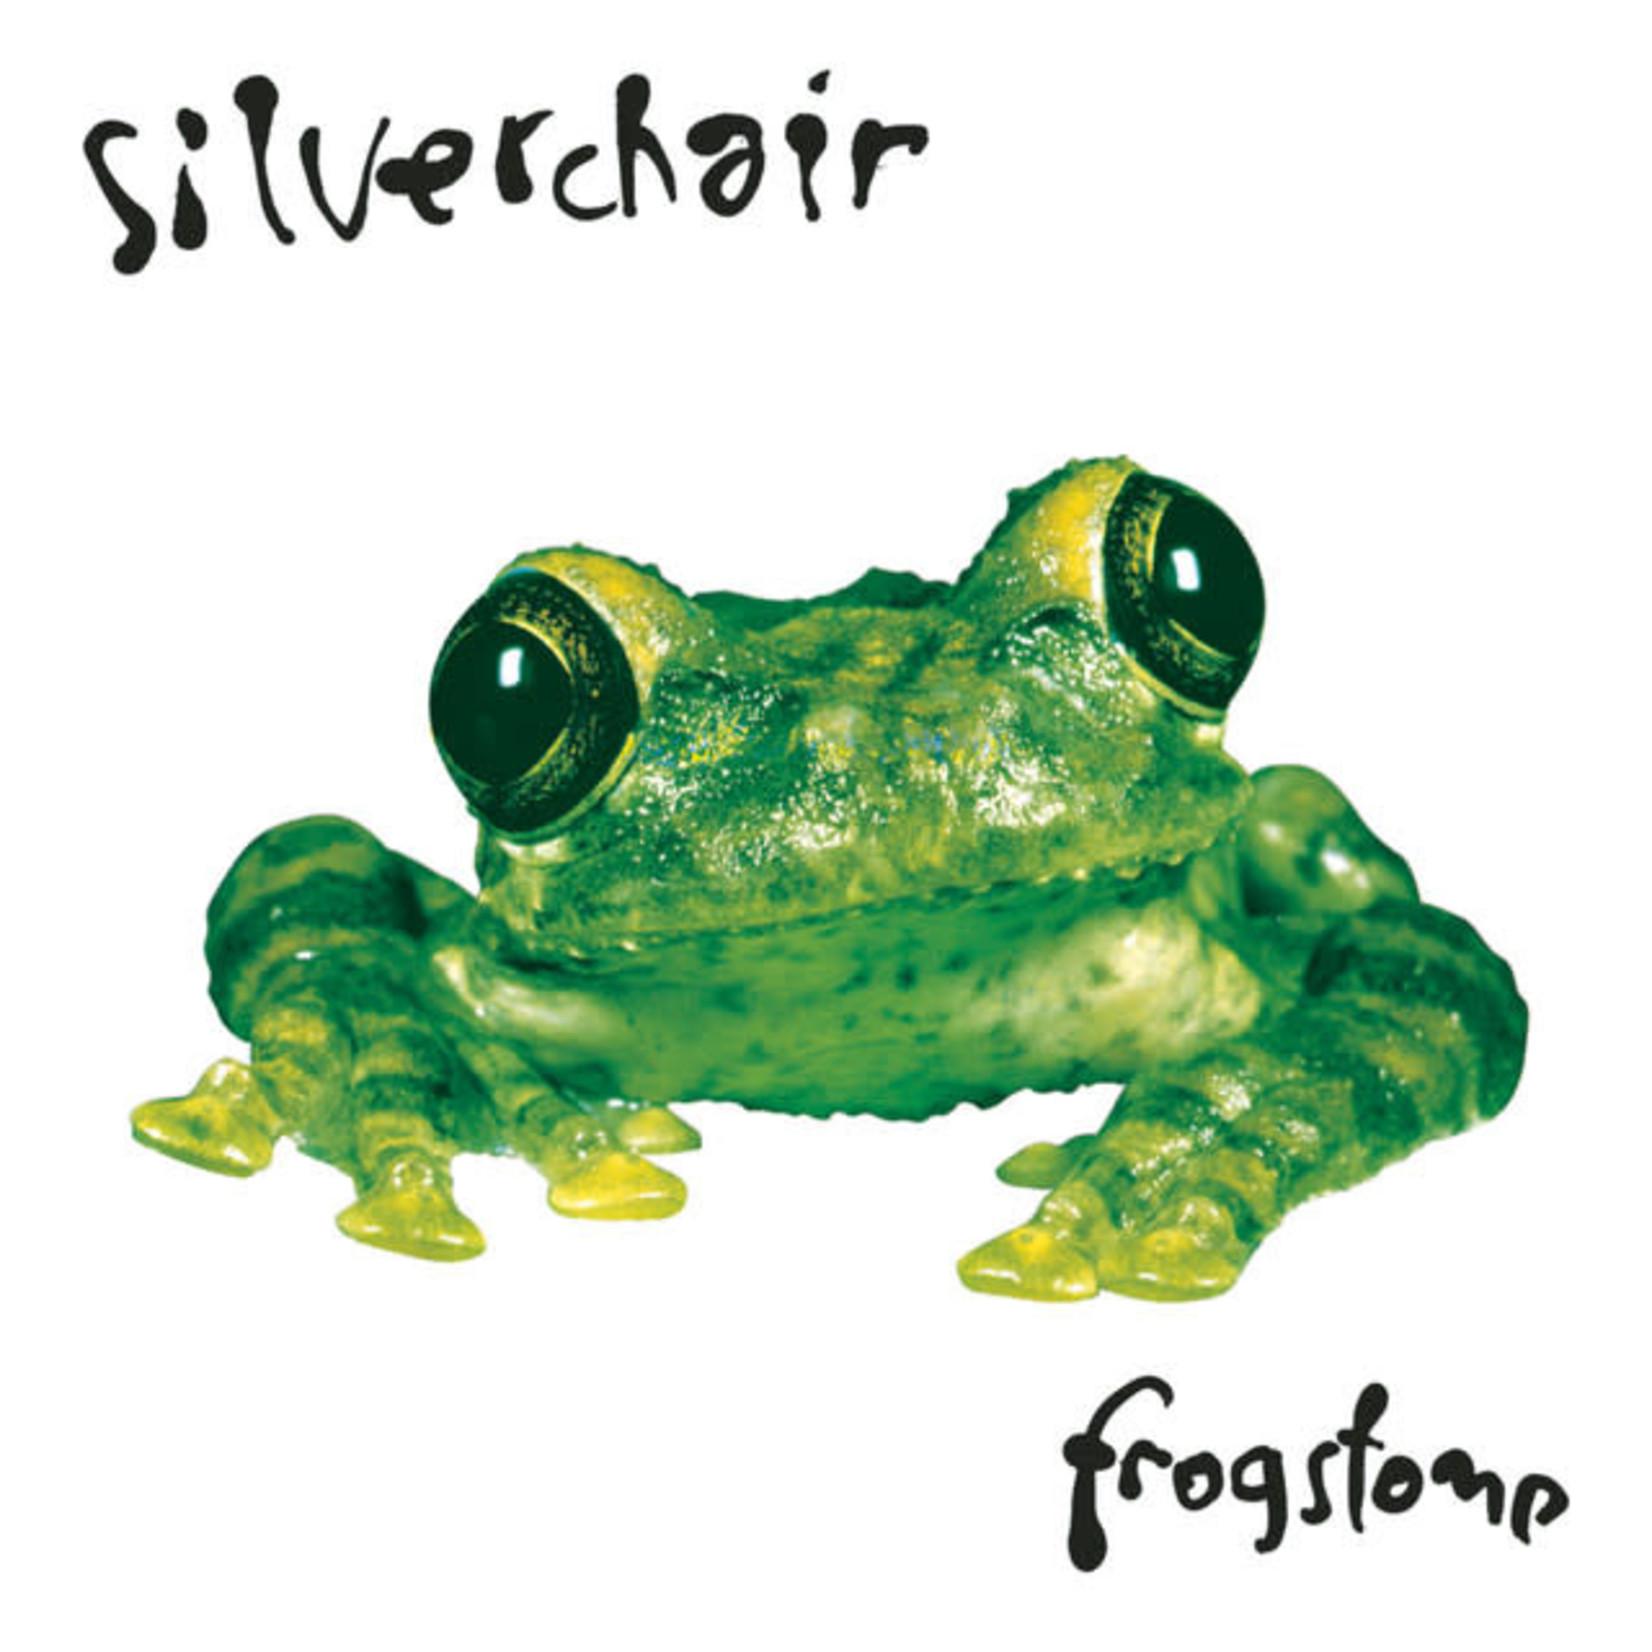 Vinyl Silverchair - Frogstomp